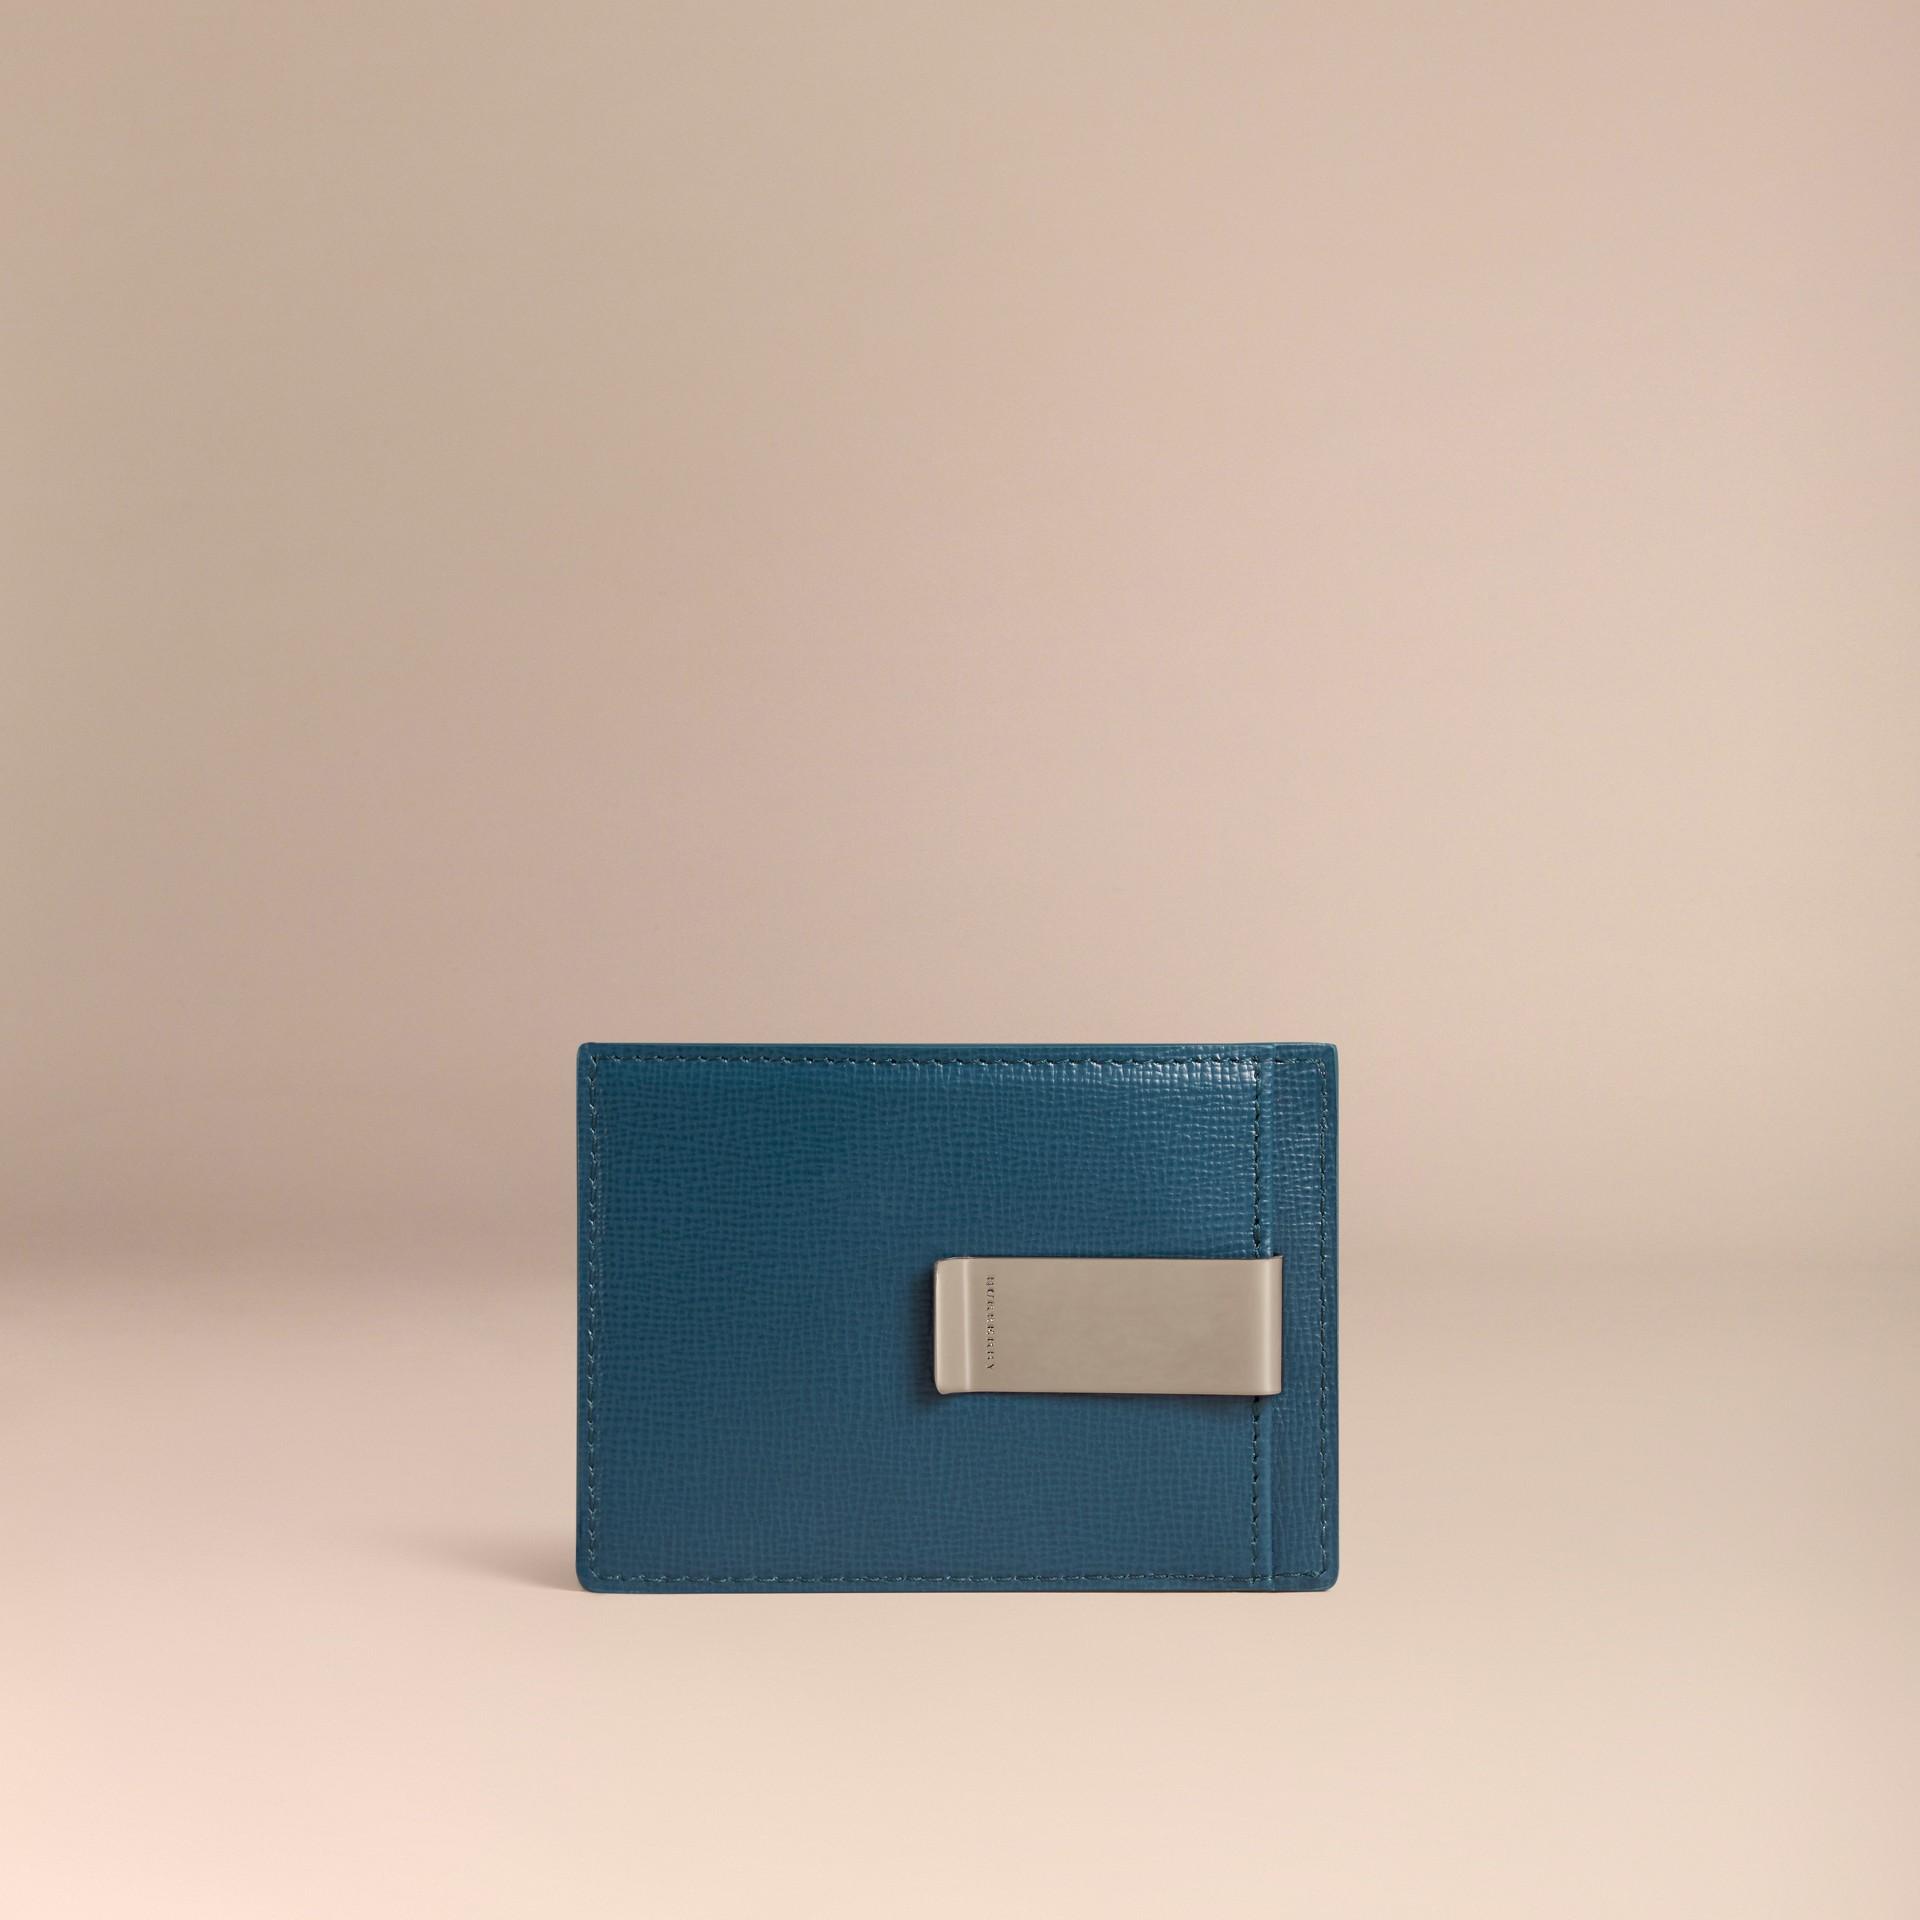 Голубой кварц Футляр для карт из кожи London Голубой Кварц - изображение 2